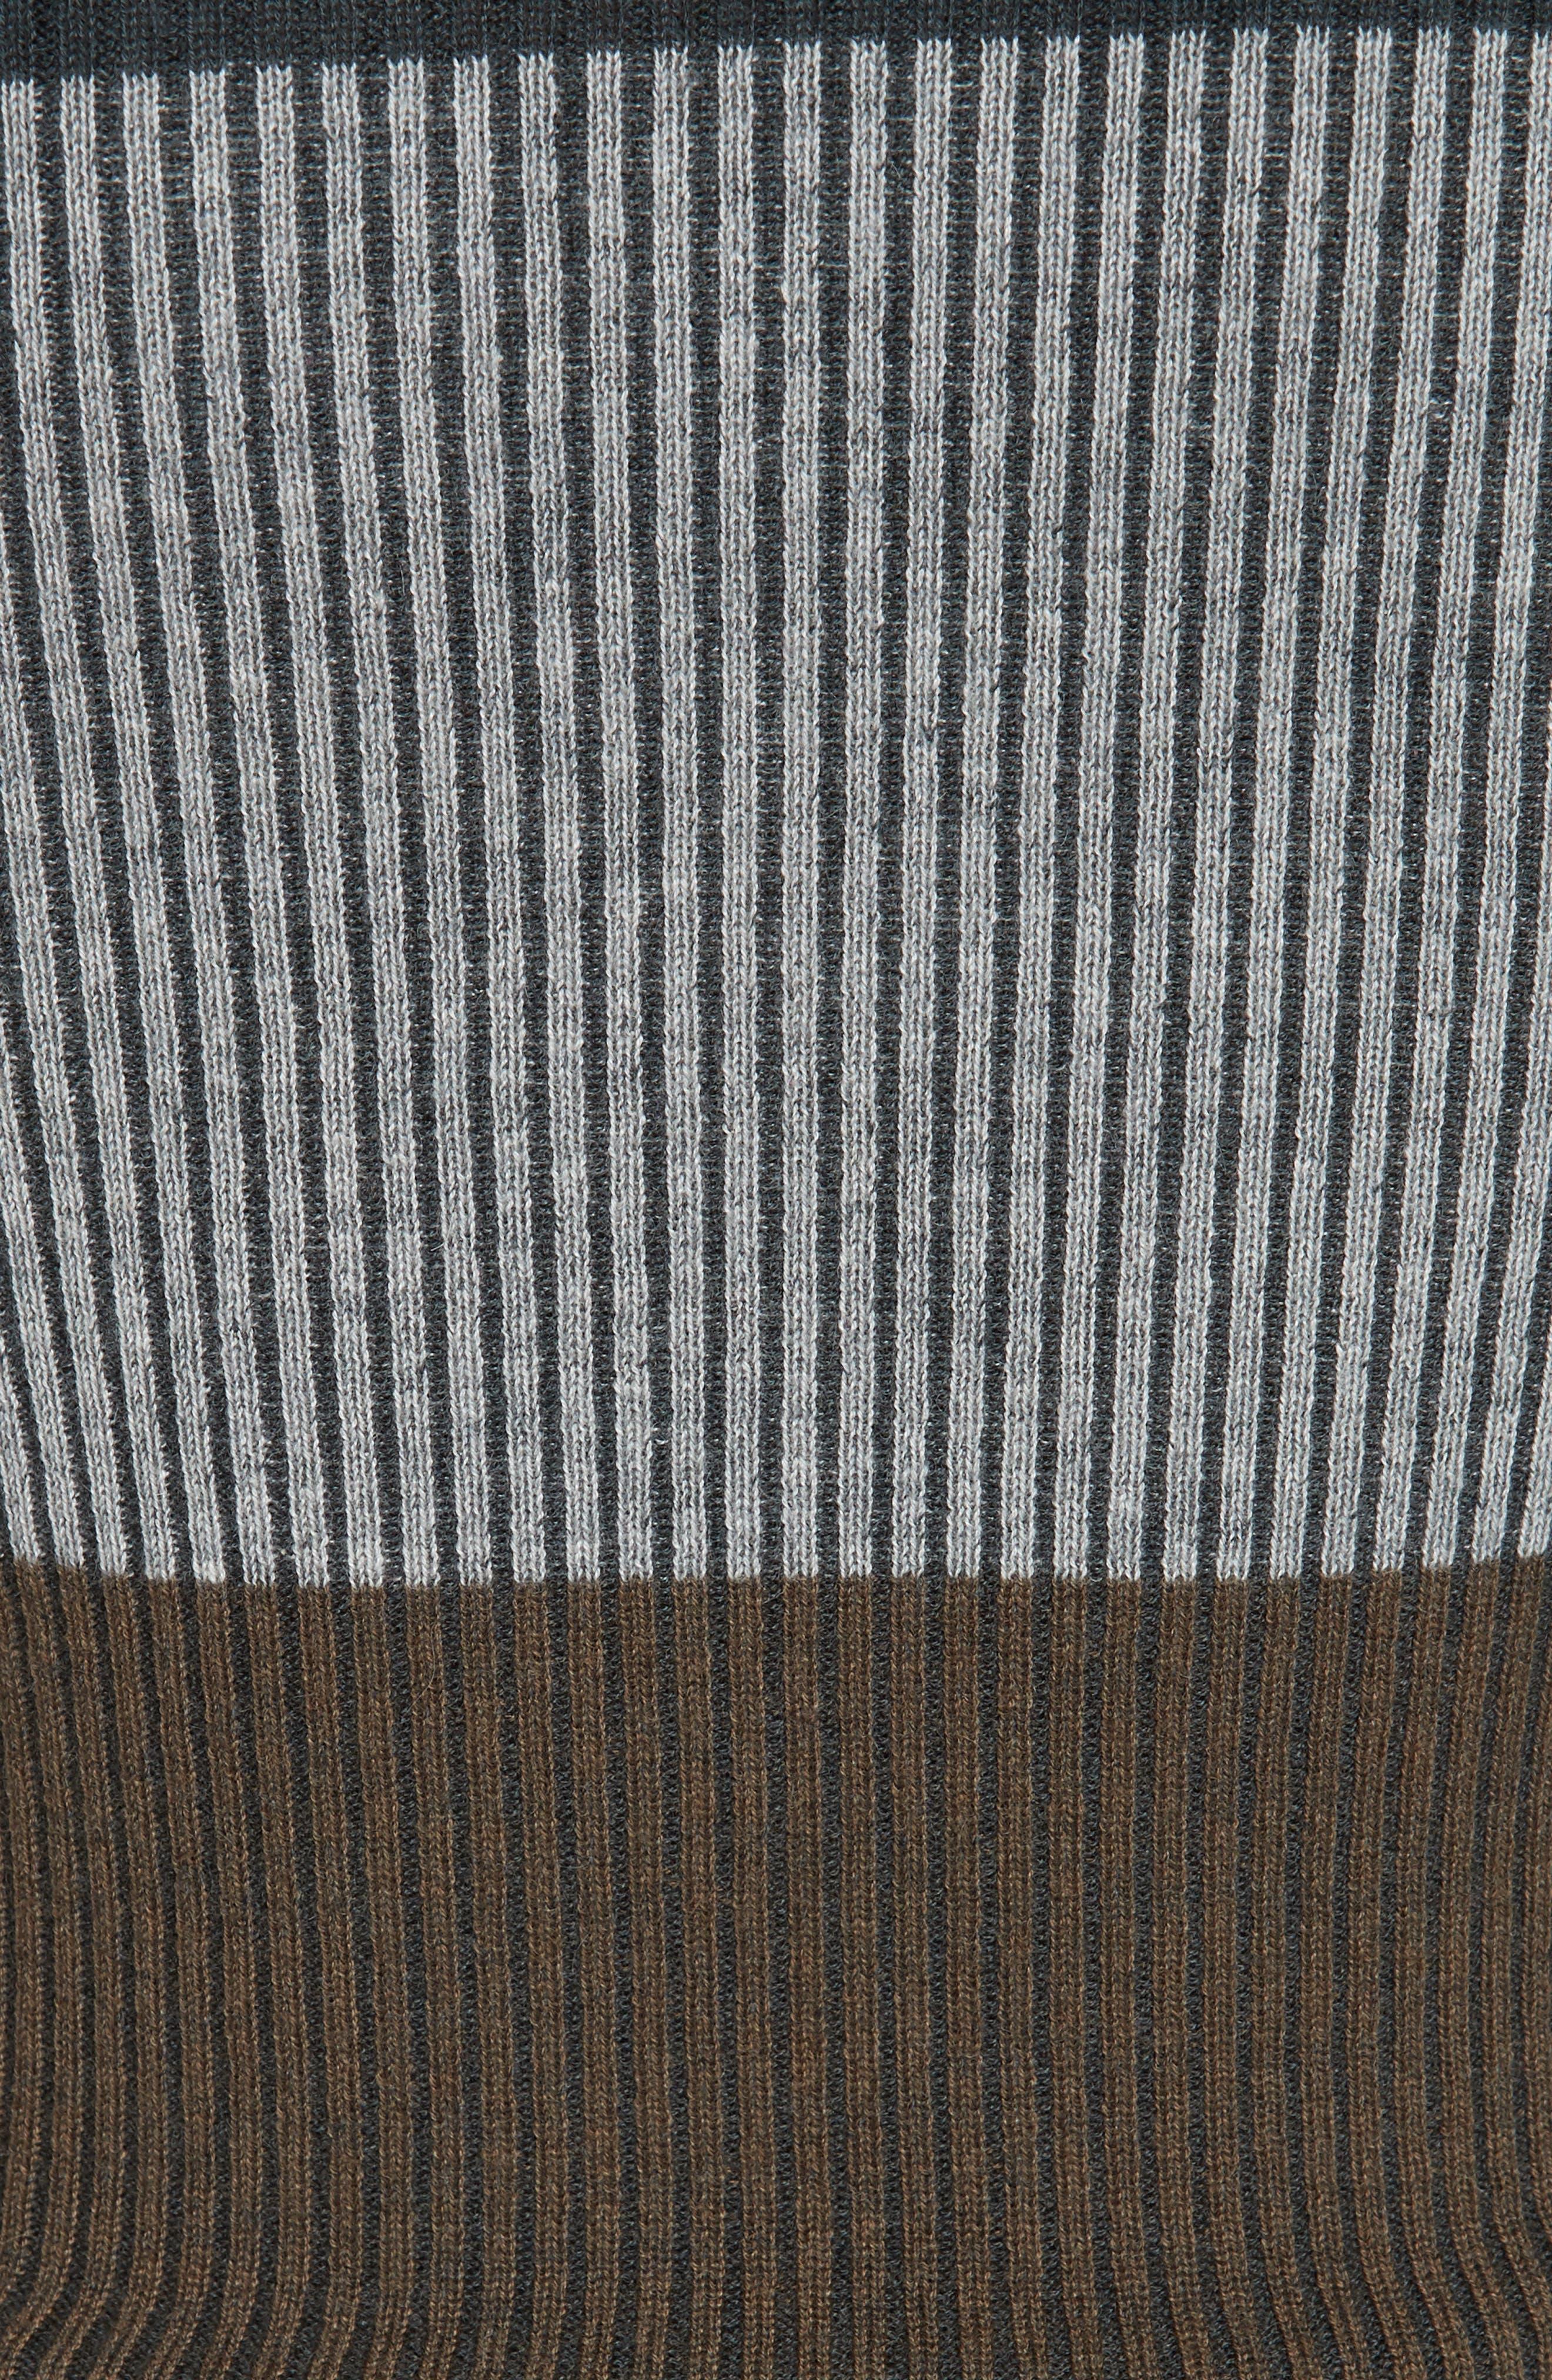 NORDSTROM SIGNATURE,                             Stripe Cashmere Sweater,                             Alternate thumbnail 5, color,                             315